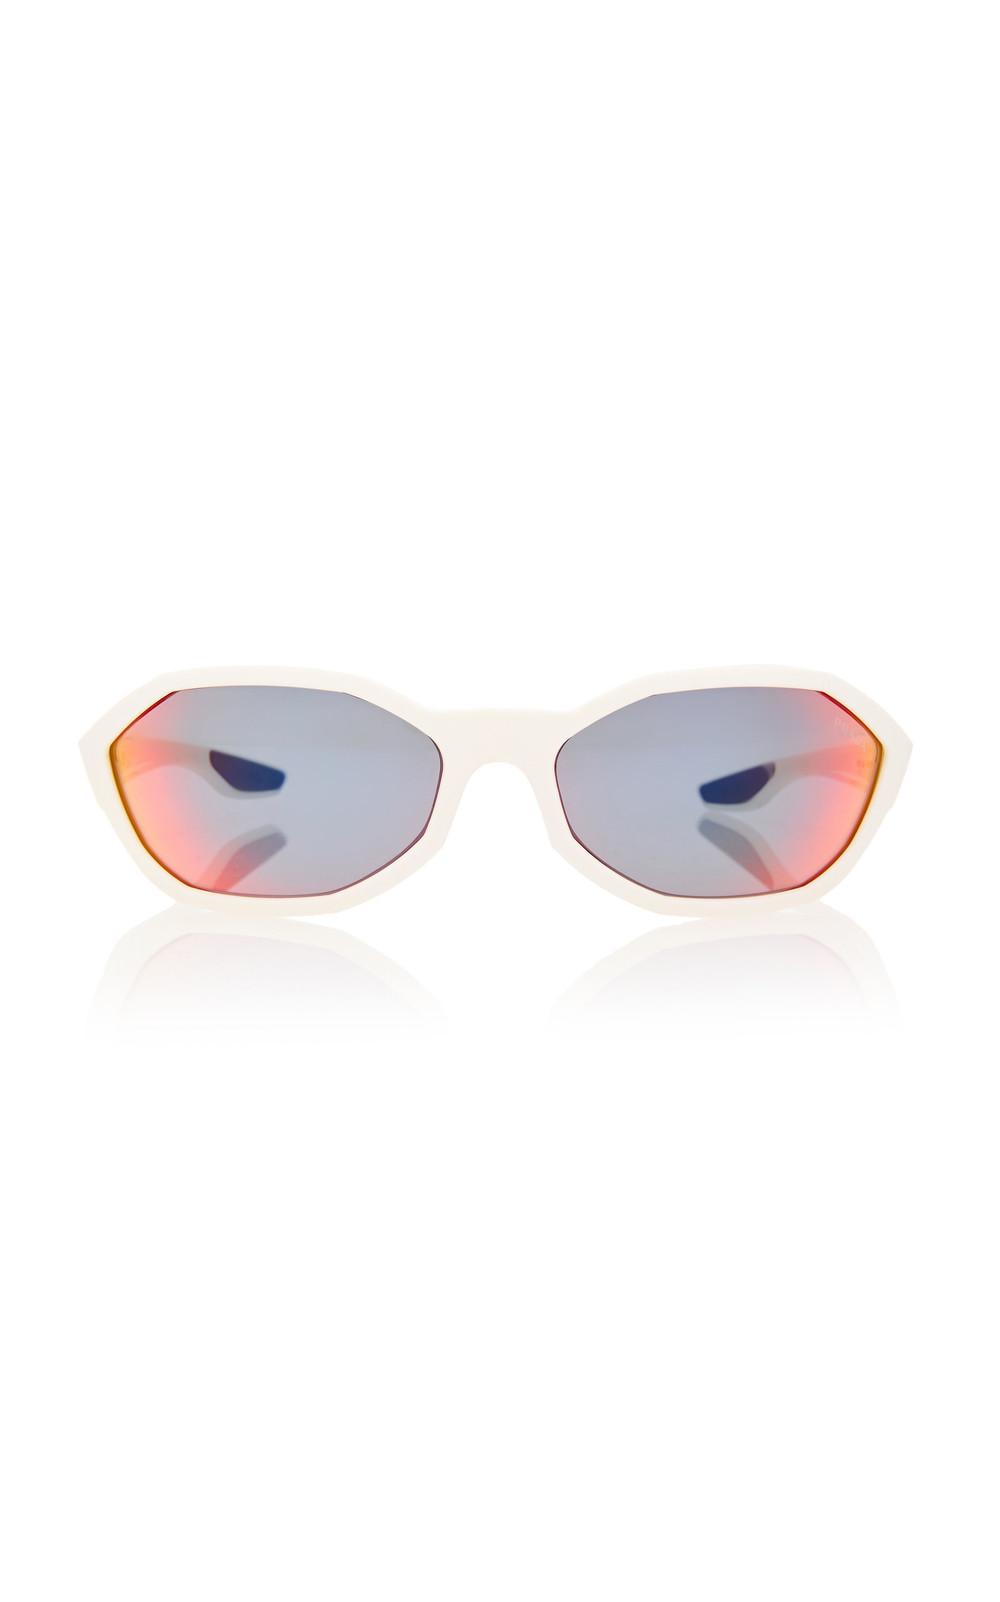 Prada Linea Rossa Hexagon-Frame Acetate Sunglasses in white